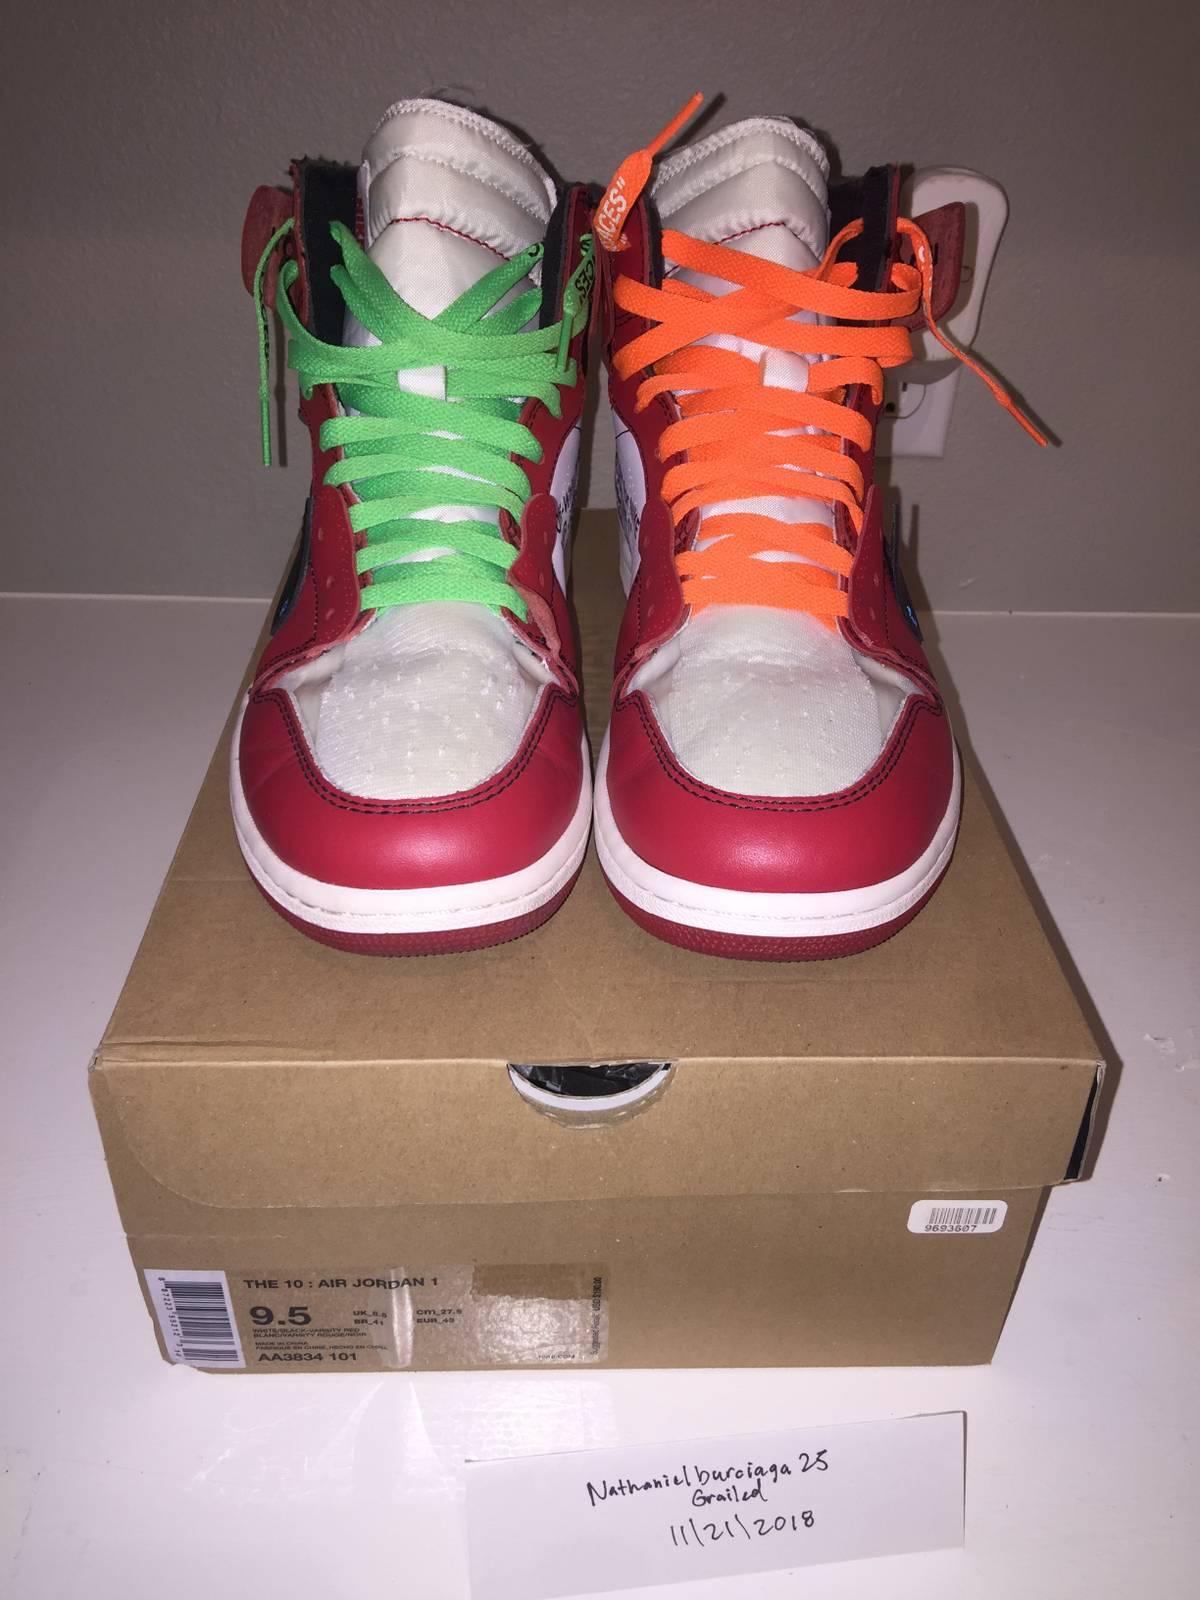 dbf623d8a879 Off-White Nike Air jordan 1 Off-white Chicago Size 9.5 - Hi-Top ...